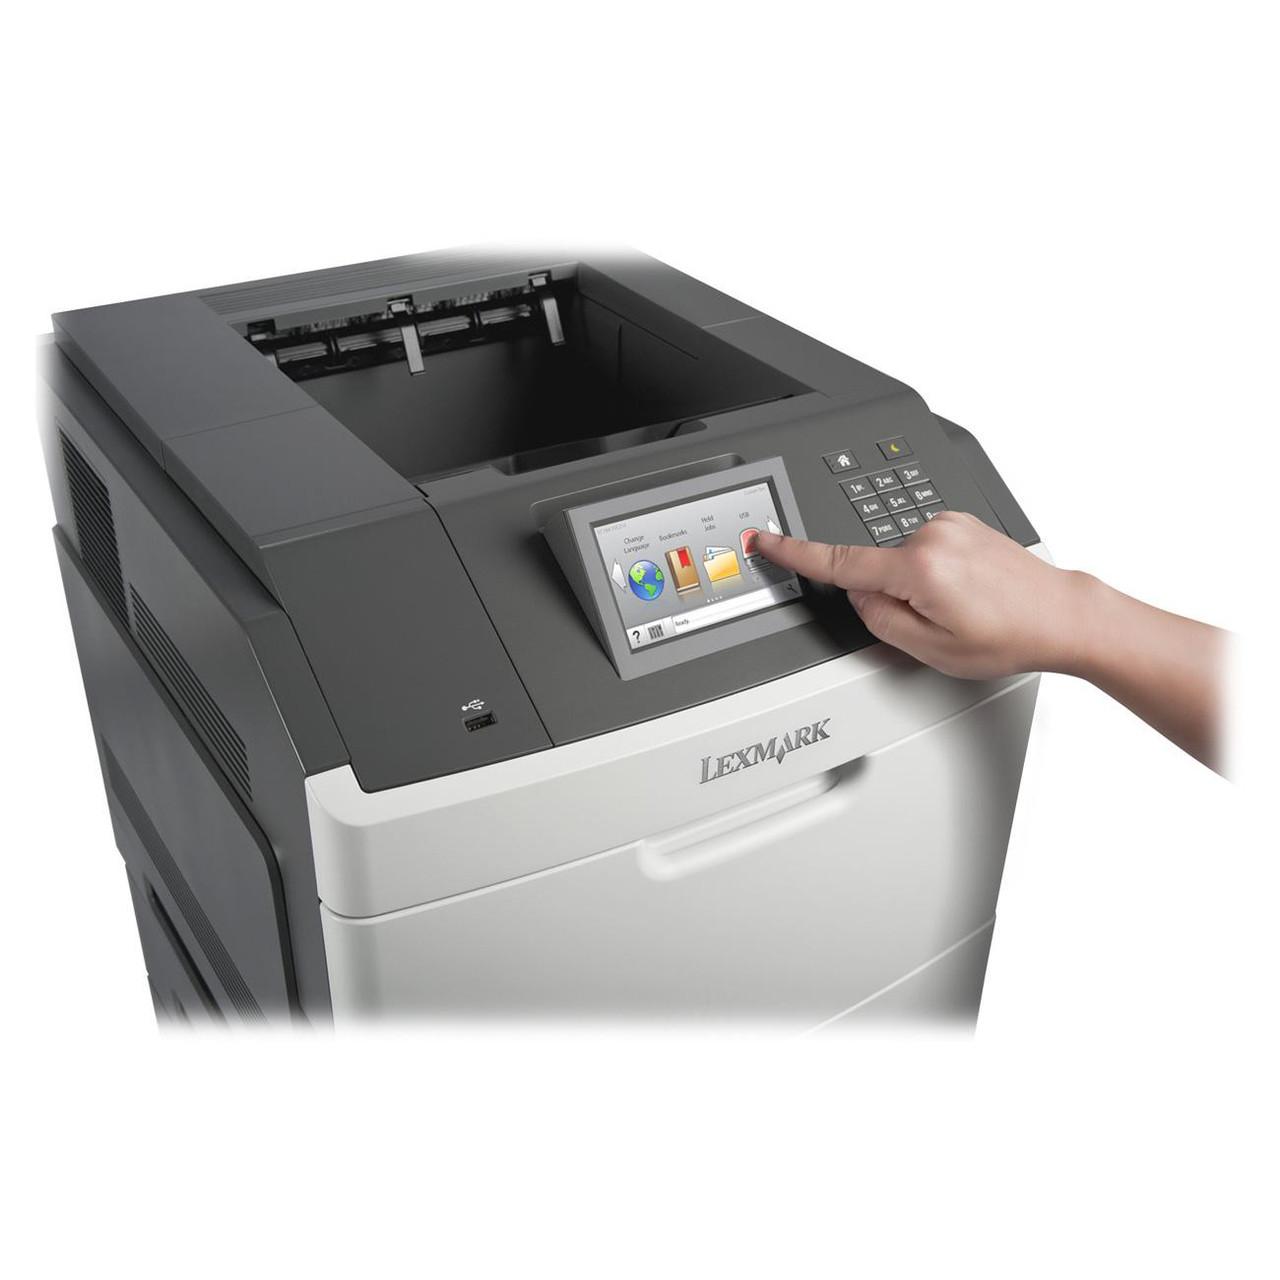 Lexmark MS810N - 40G0100 - Lexmark Laser Printer for sale